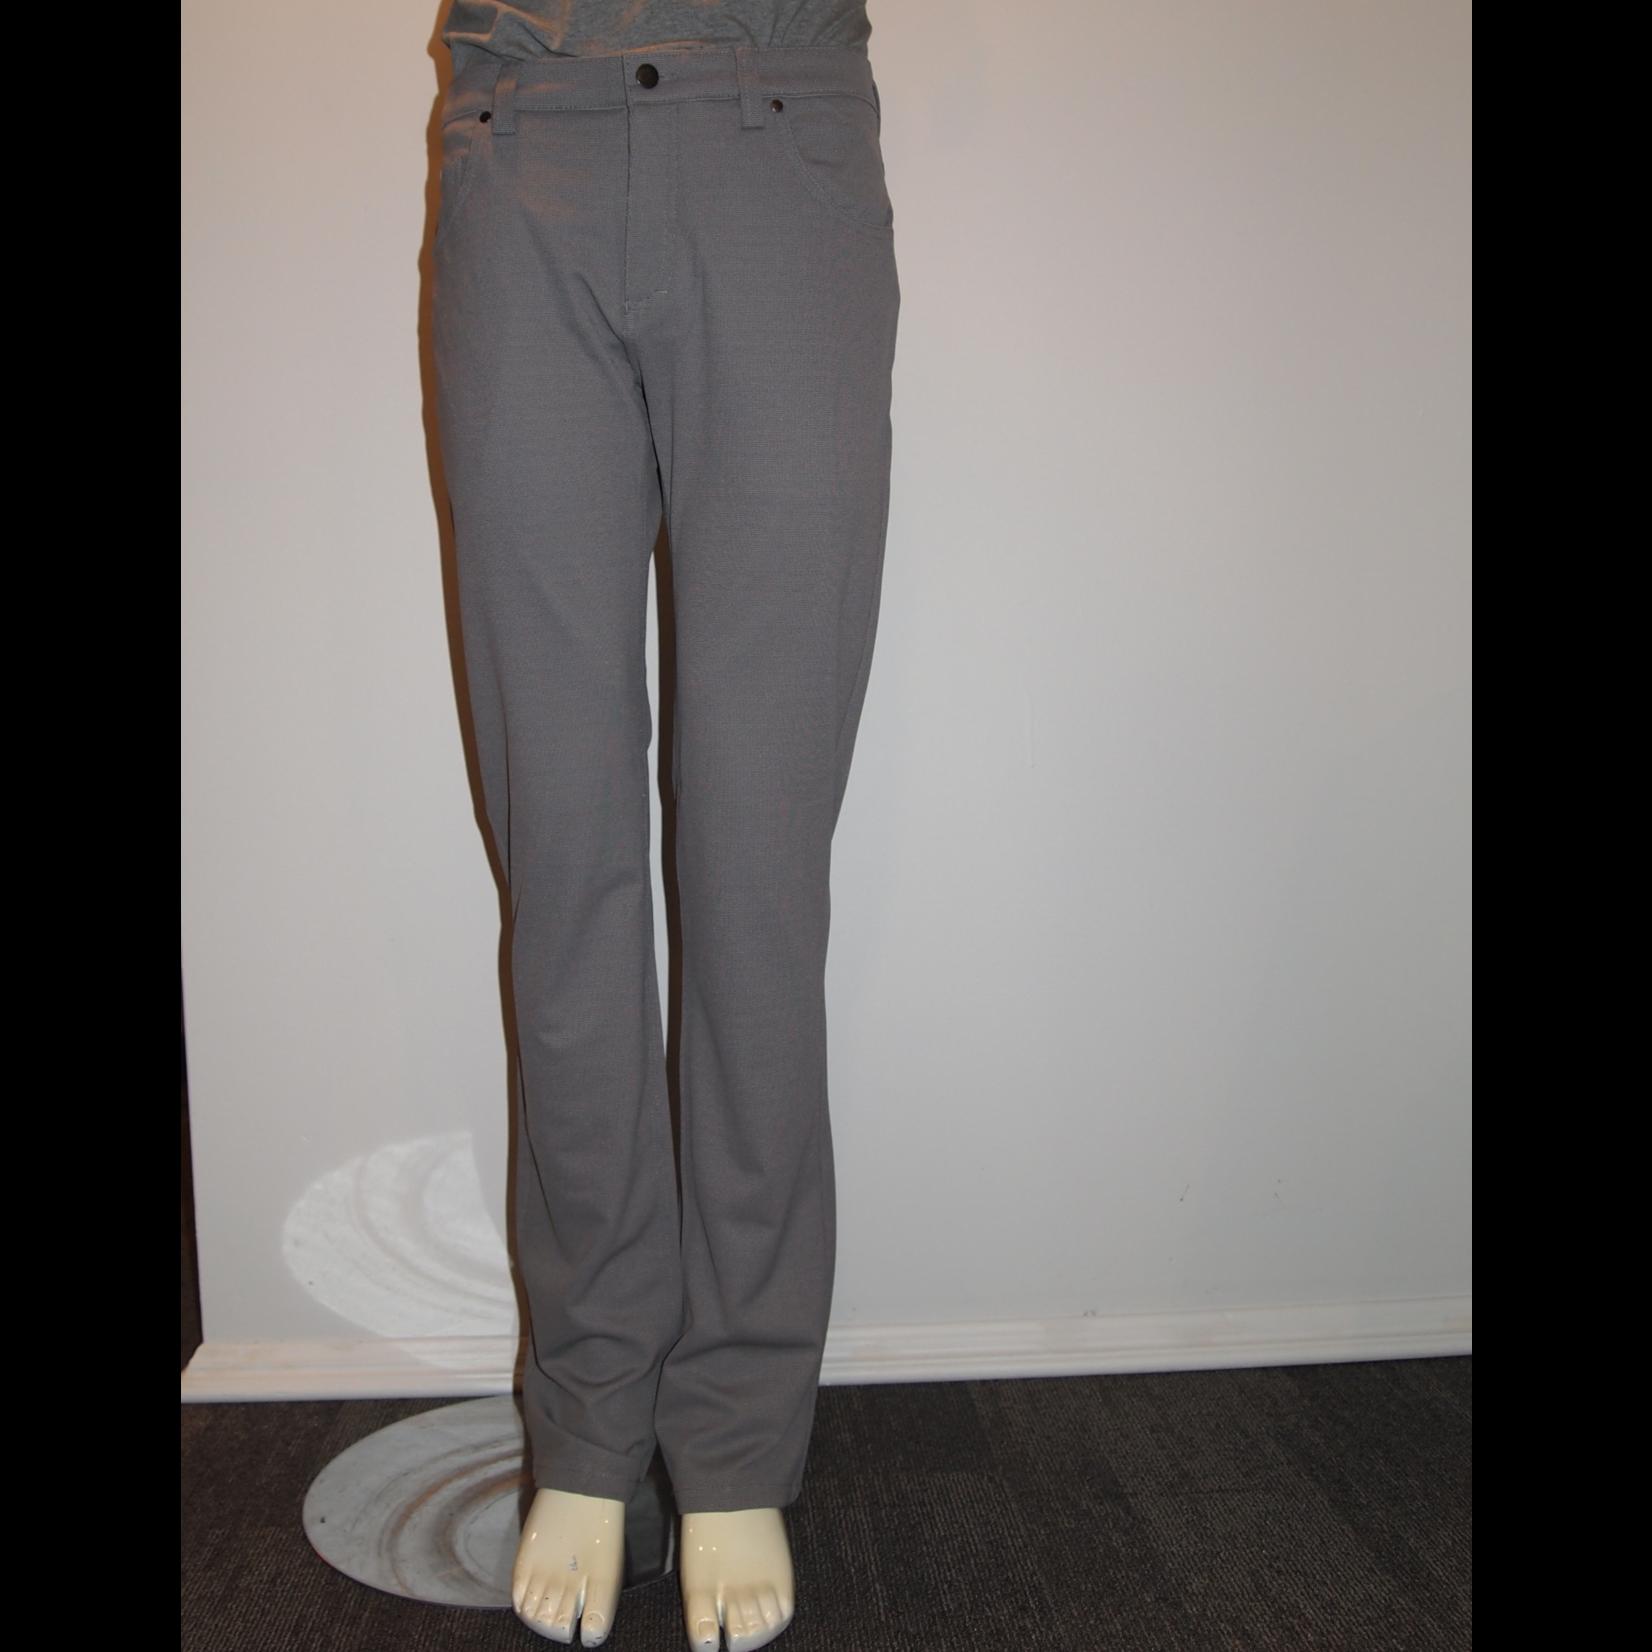 Bertini M1601M097 Pin Dot Knit 5-Pocket Pant